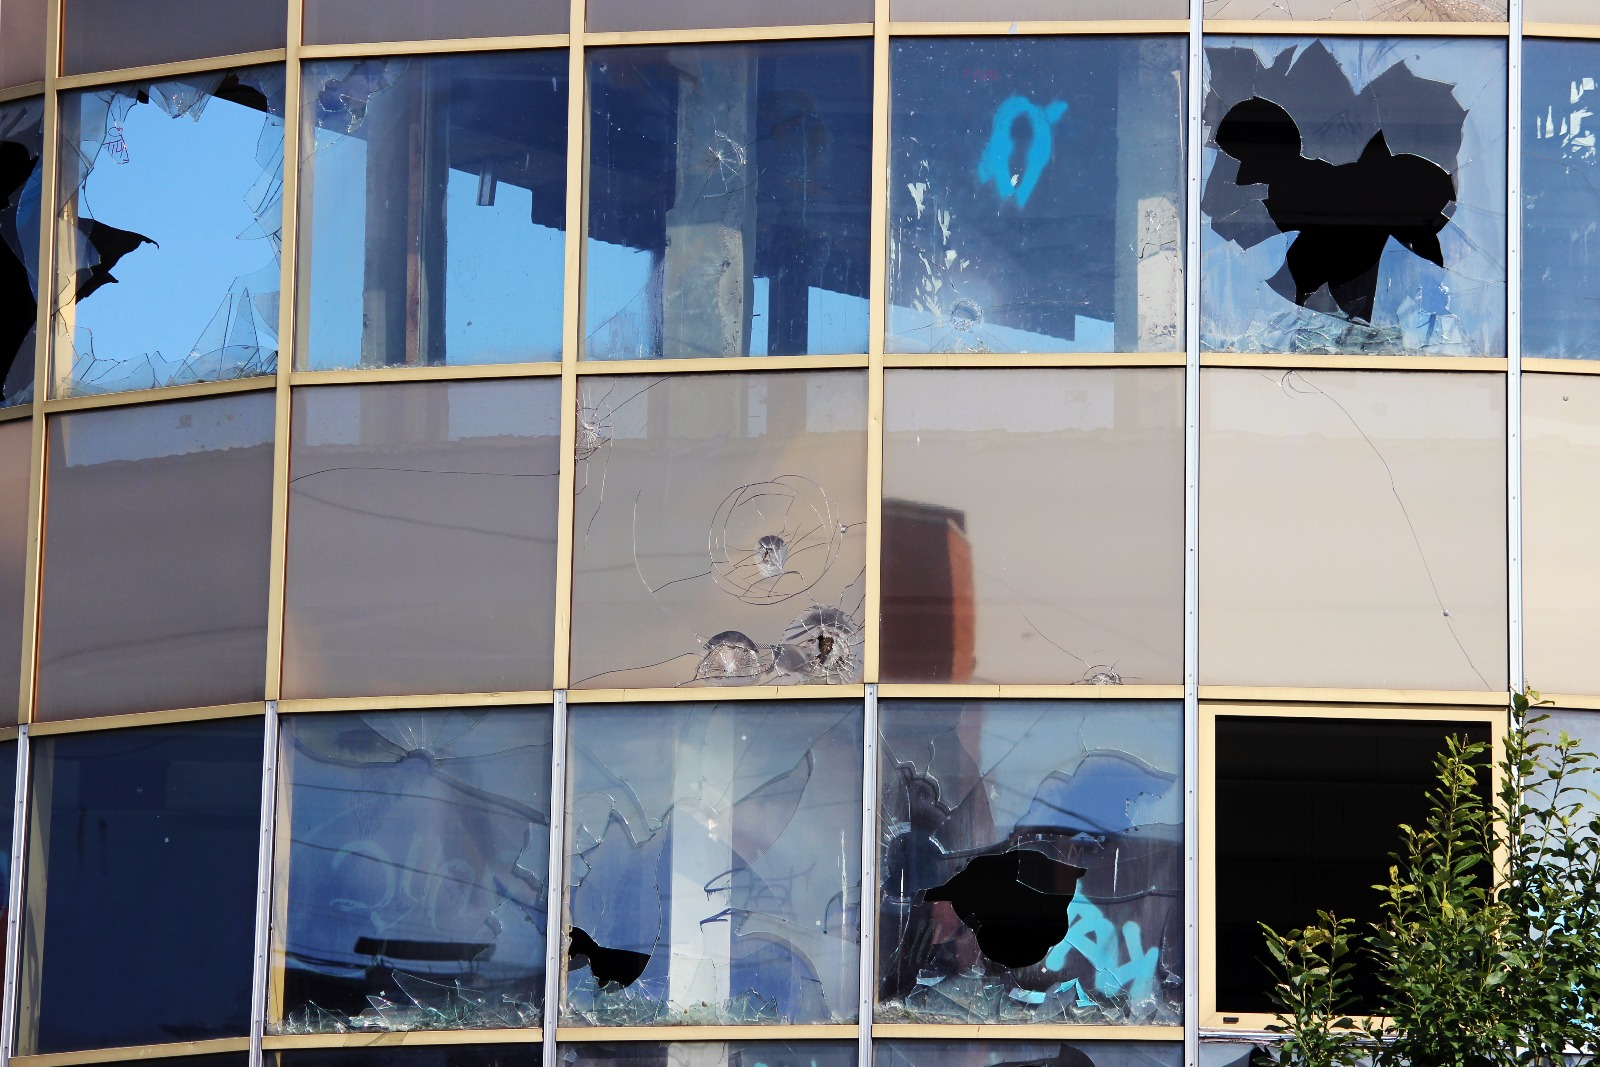 Demers Glass LLC Peoria (602)361-7157